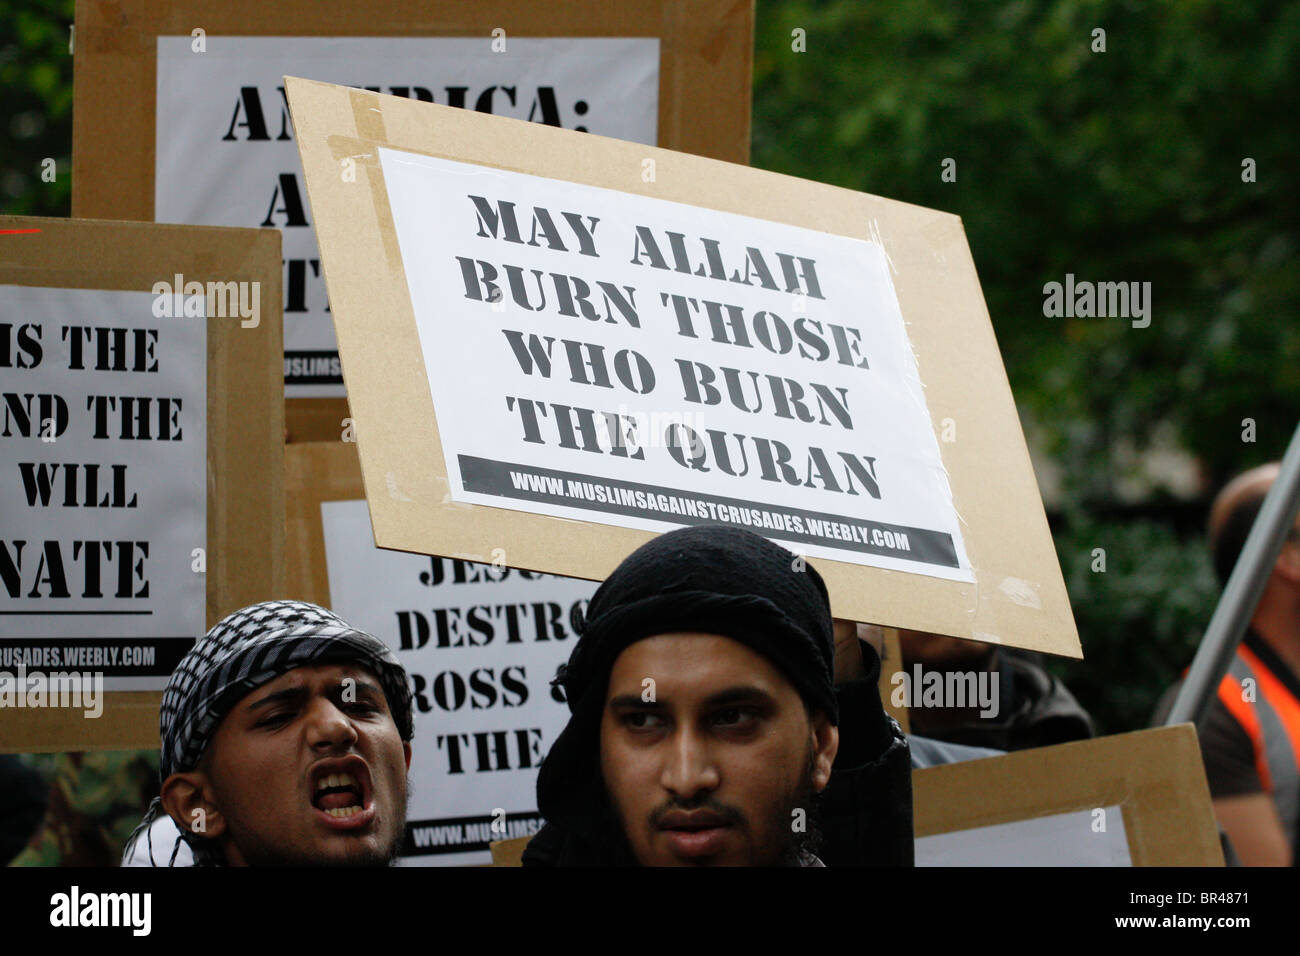 Muslims Against Crusades (MAC) group, September 11th 2010 - Stock Image